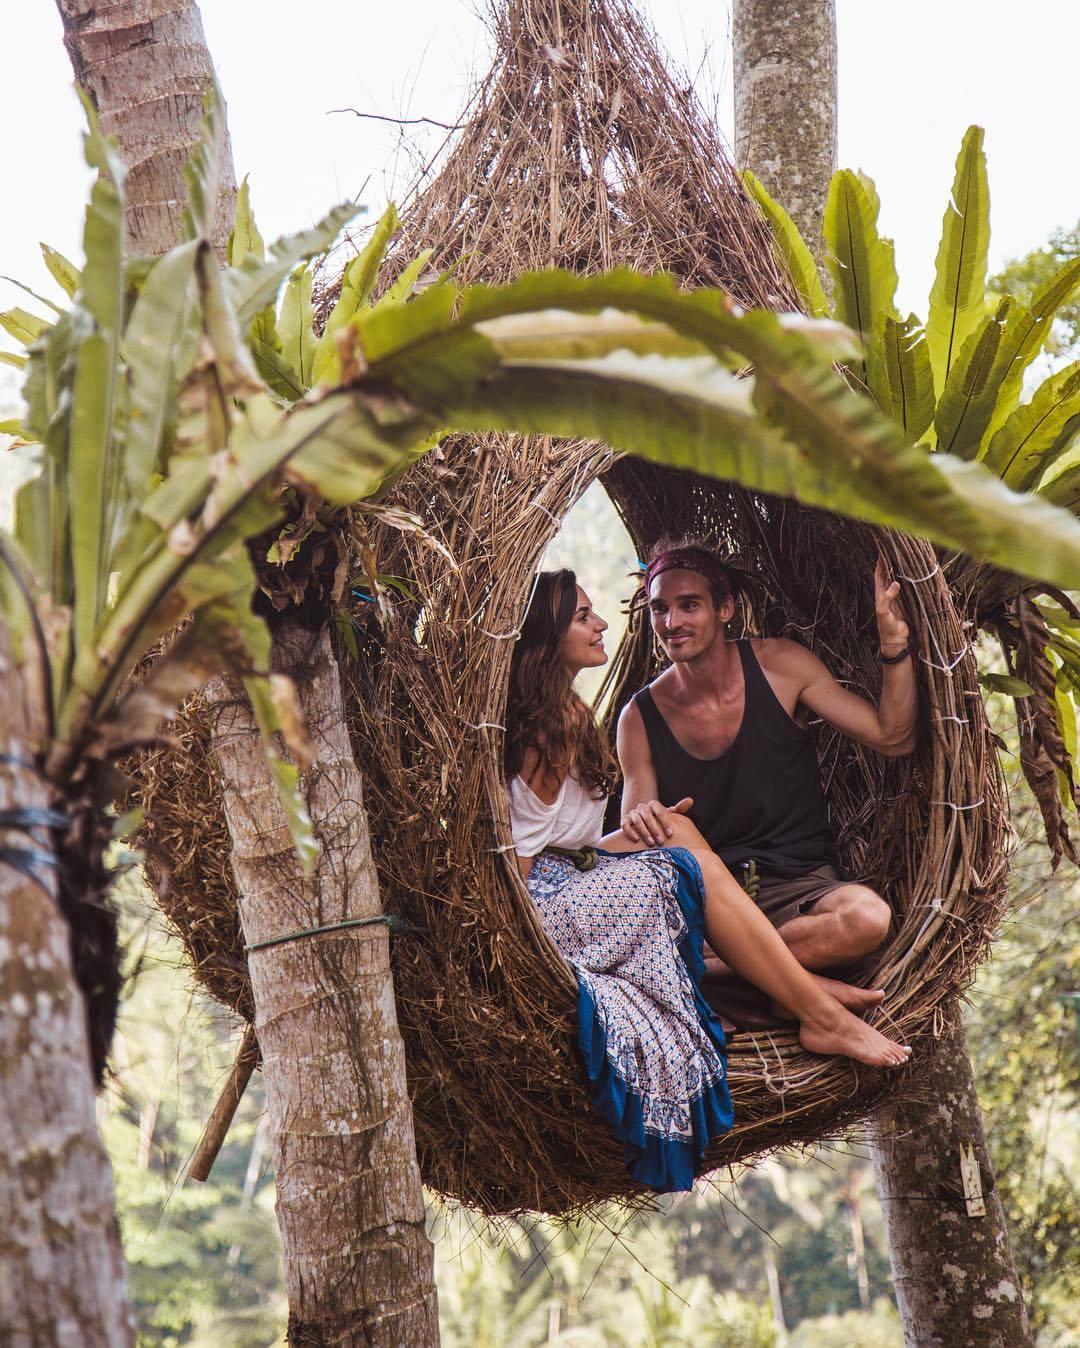 Raya surprised her partner Louis in Bali during his world flight voyage. Photo: @jcpieri